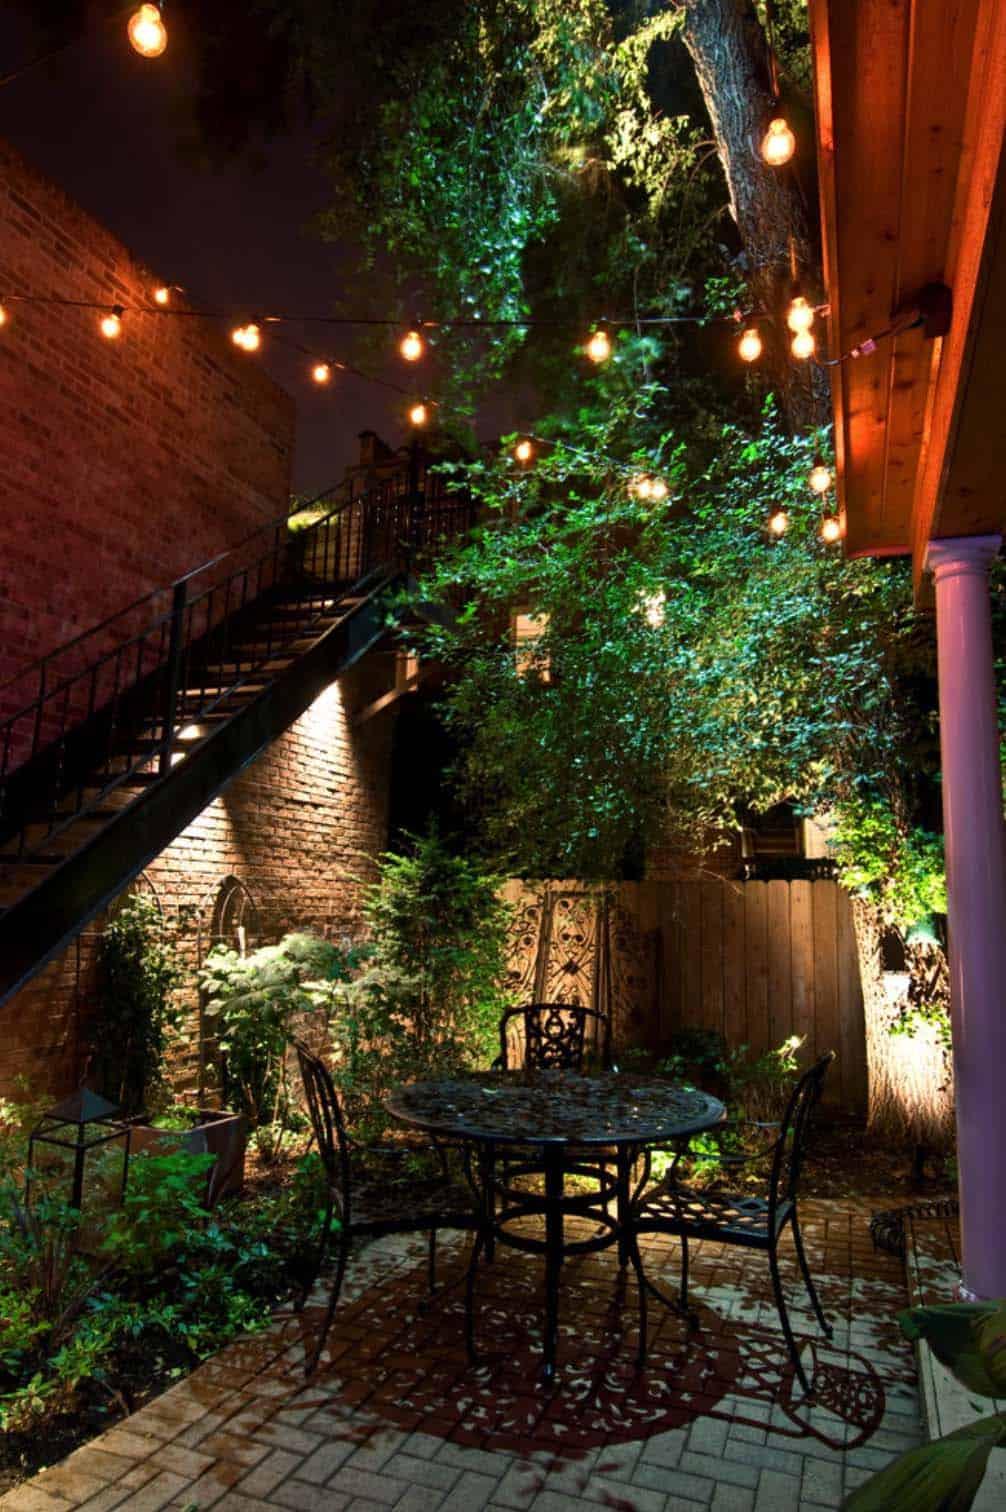 25 Very inspiring string light ideas for magical outdoor ... on Backyard String Light Designs id=61993